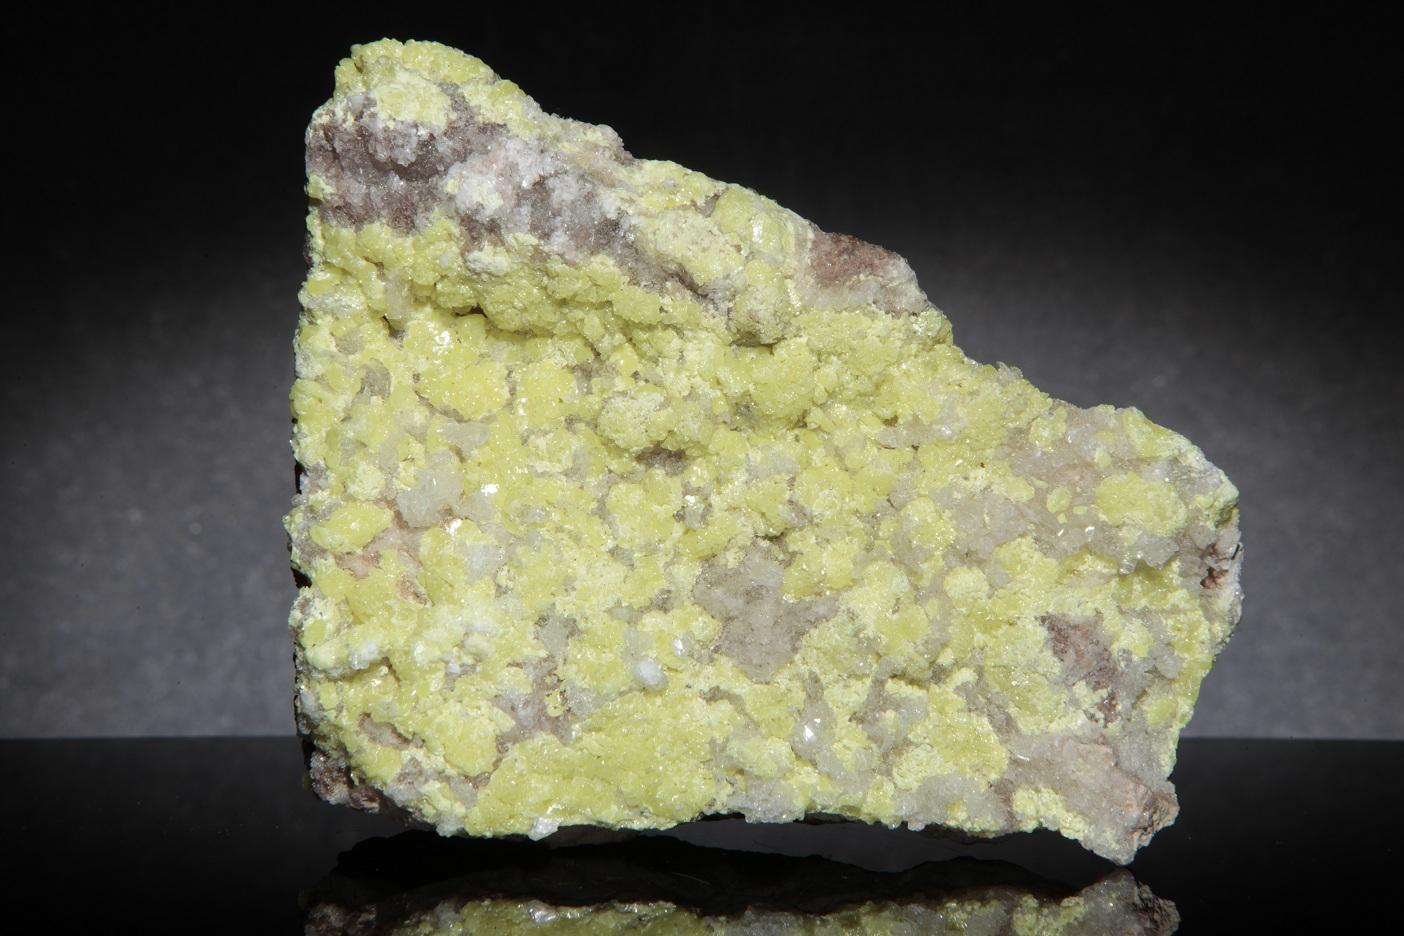 Sulfur - D16-35 - Scofield Quarry - USA Mineral Specimen |Sulfur Mineral